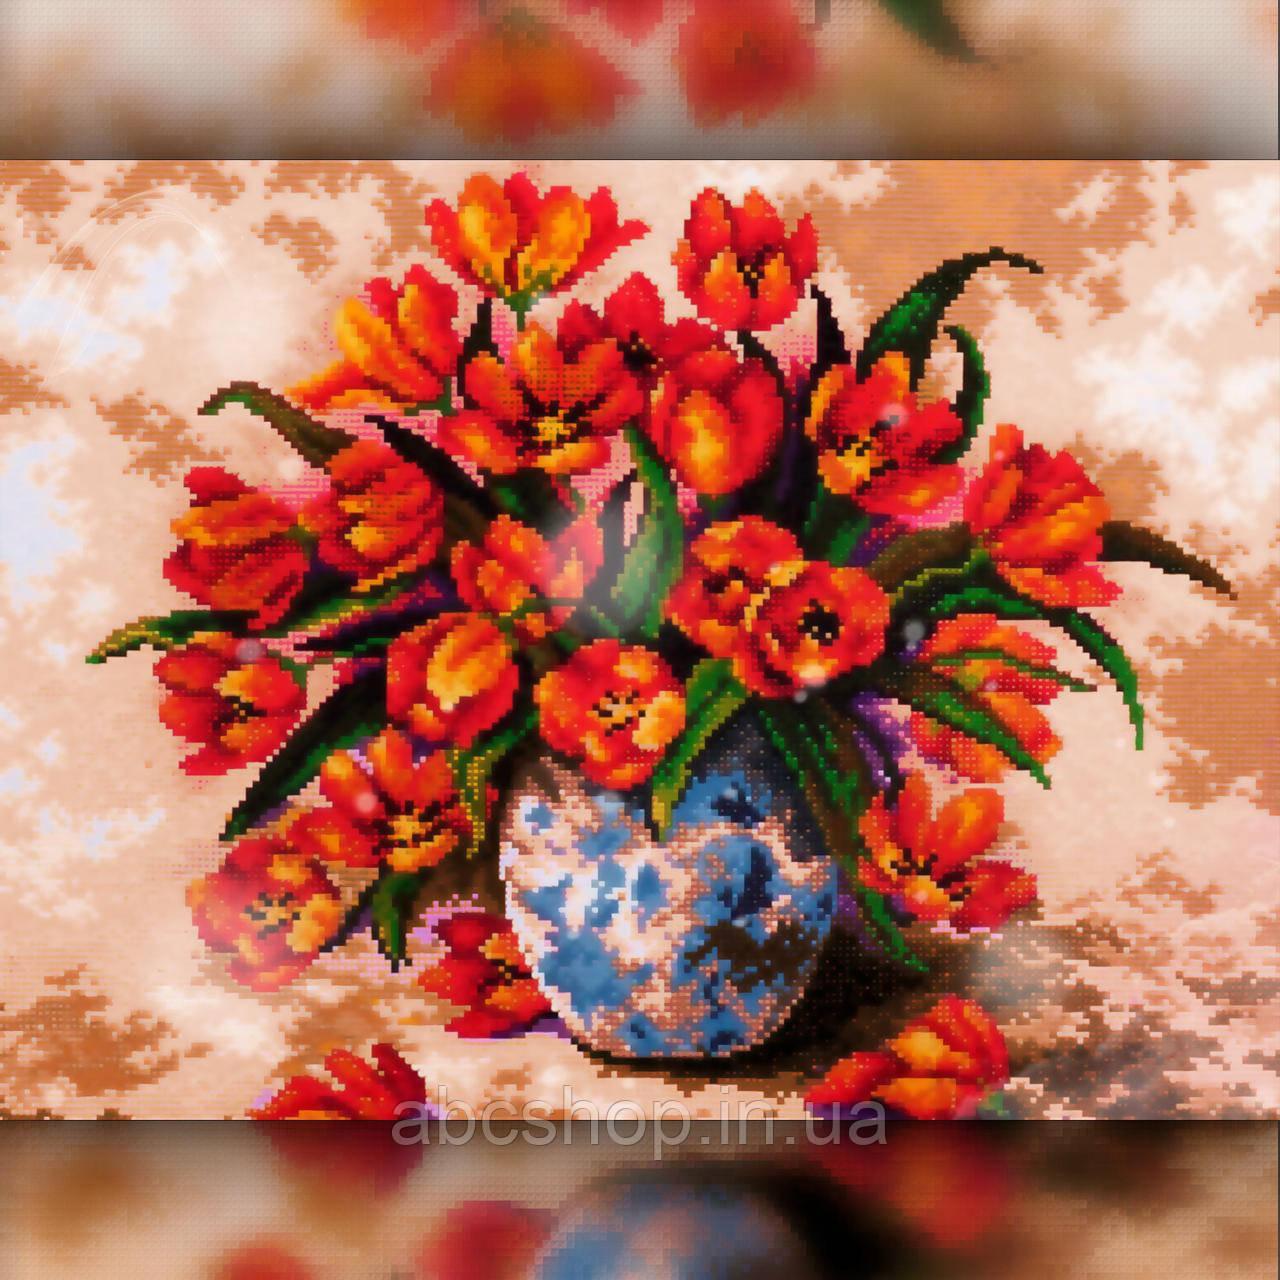 Алмазная вышивка Красные тюльпаны в вазе 40x50 The Wortex Diamonds (TWD10071L)